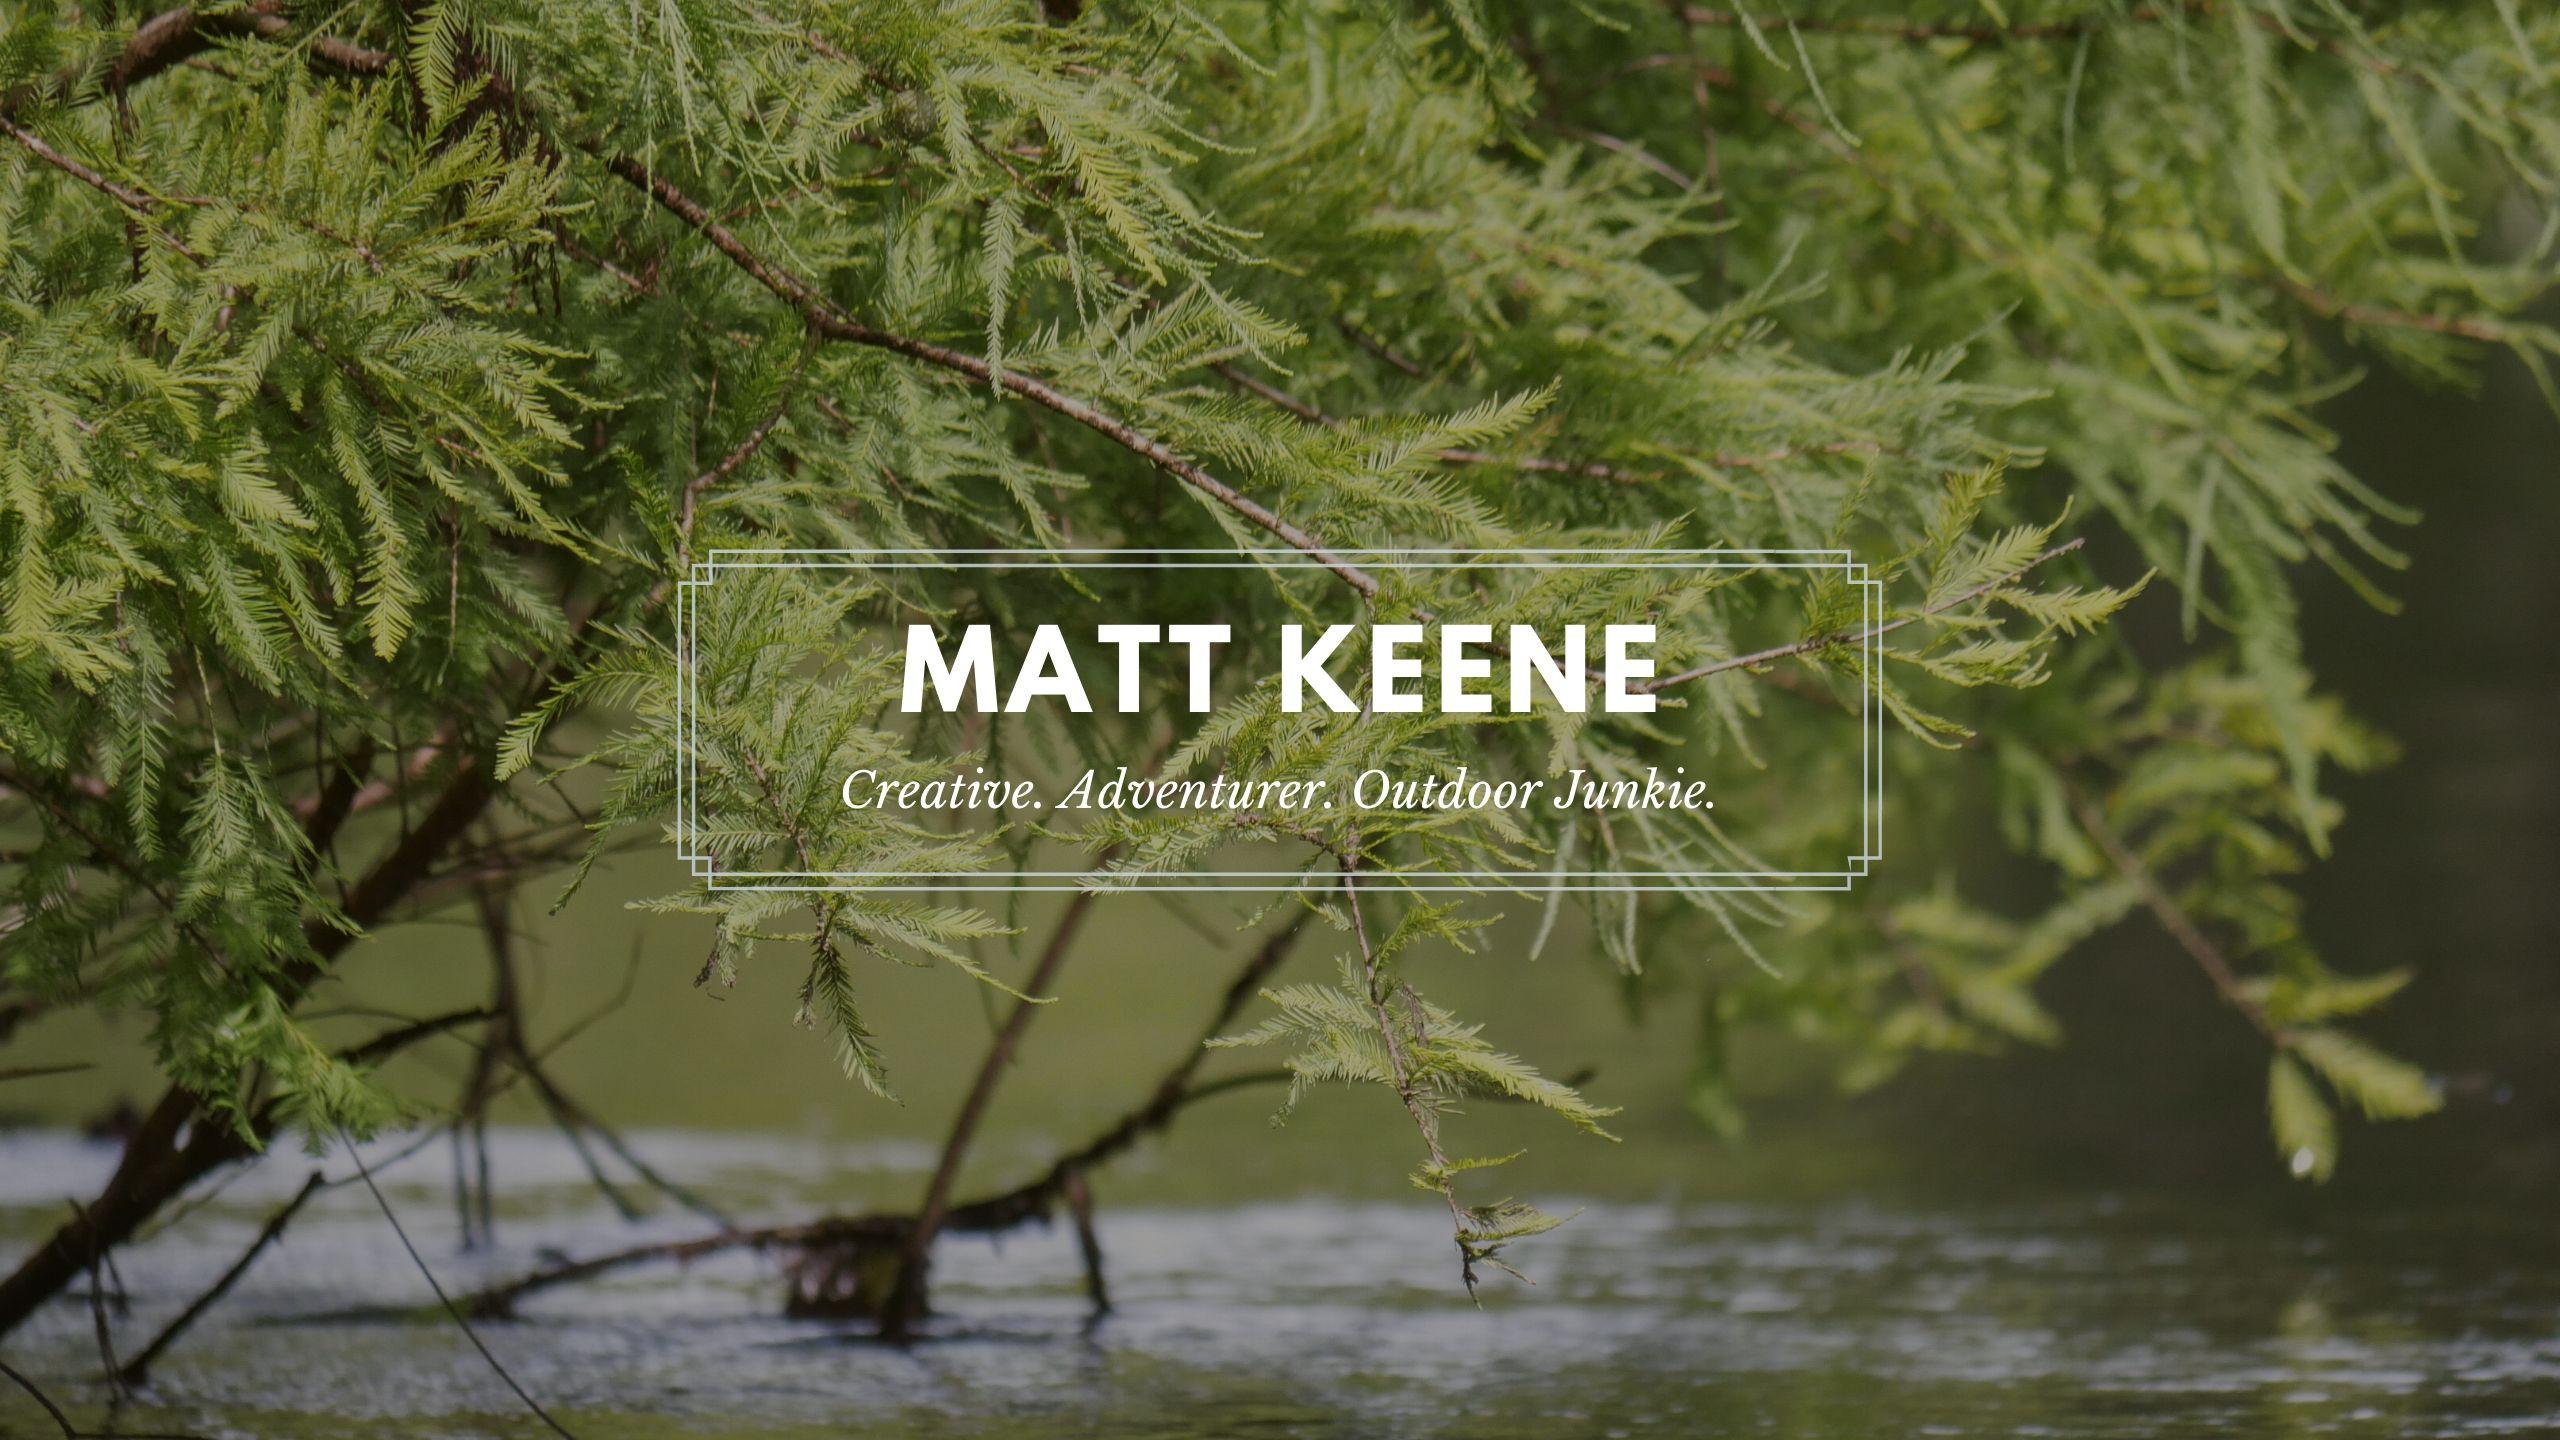 Matt Keene: Creative. Adventurer. Outdoor Junkie.